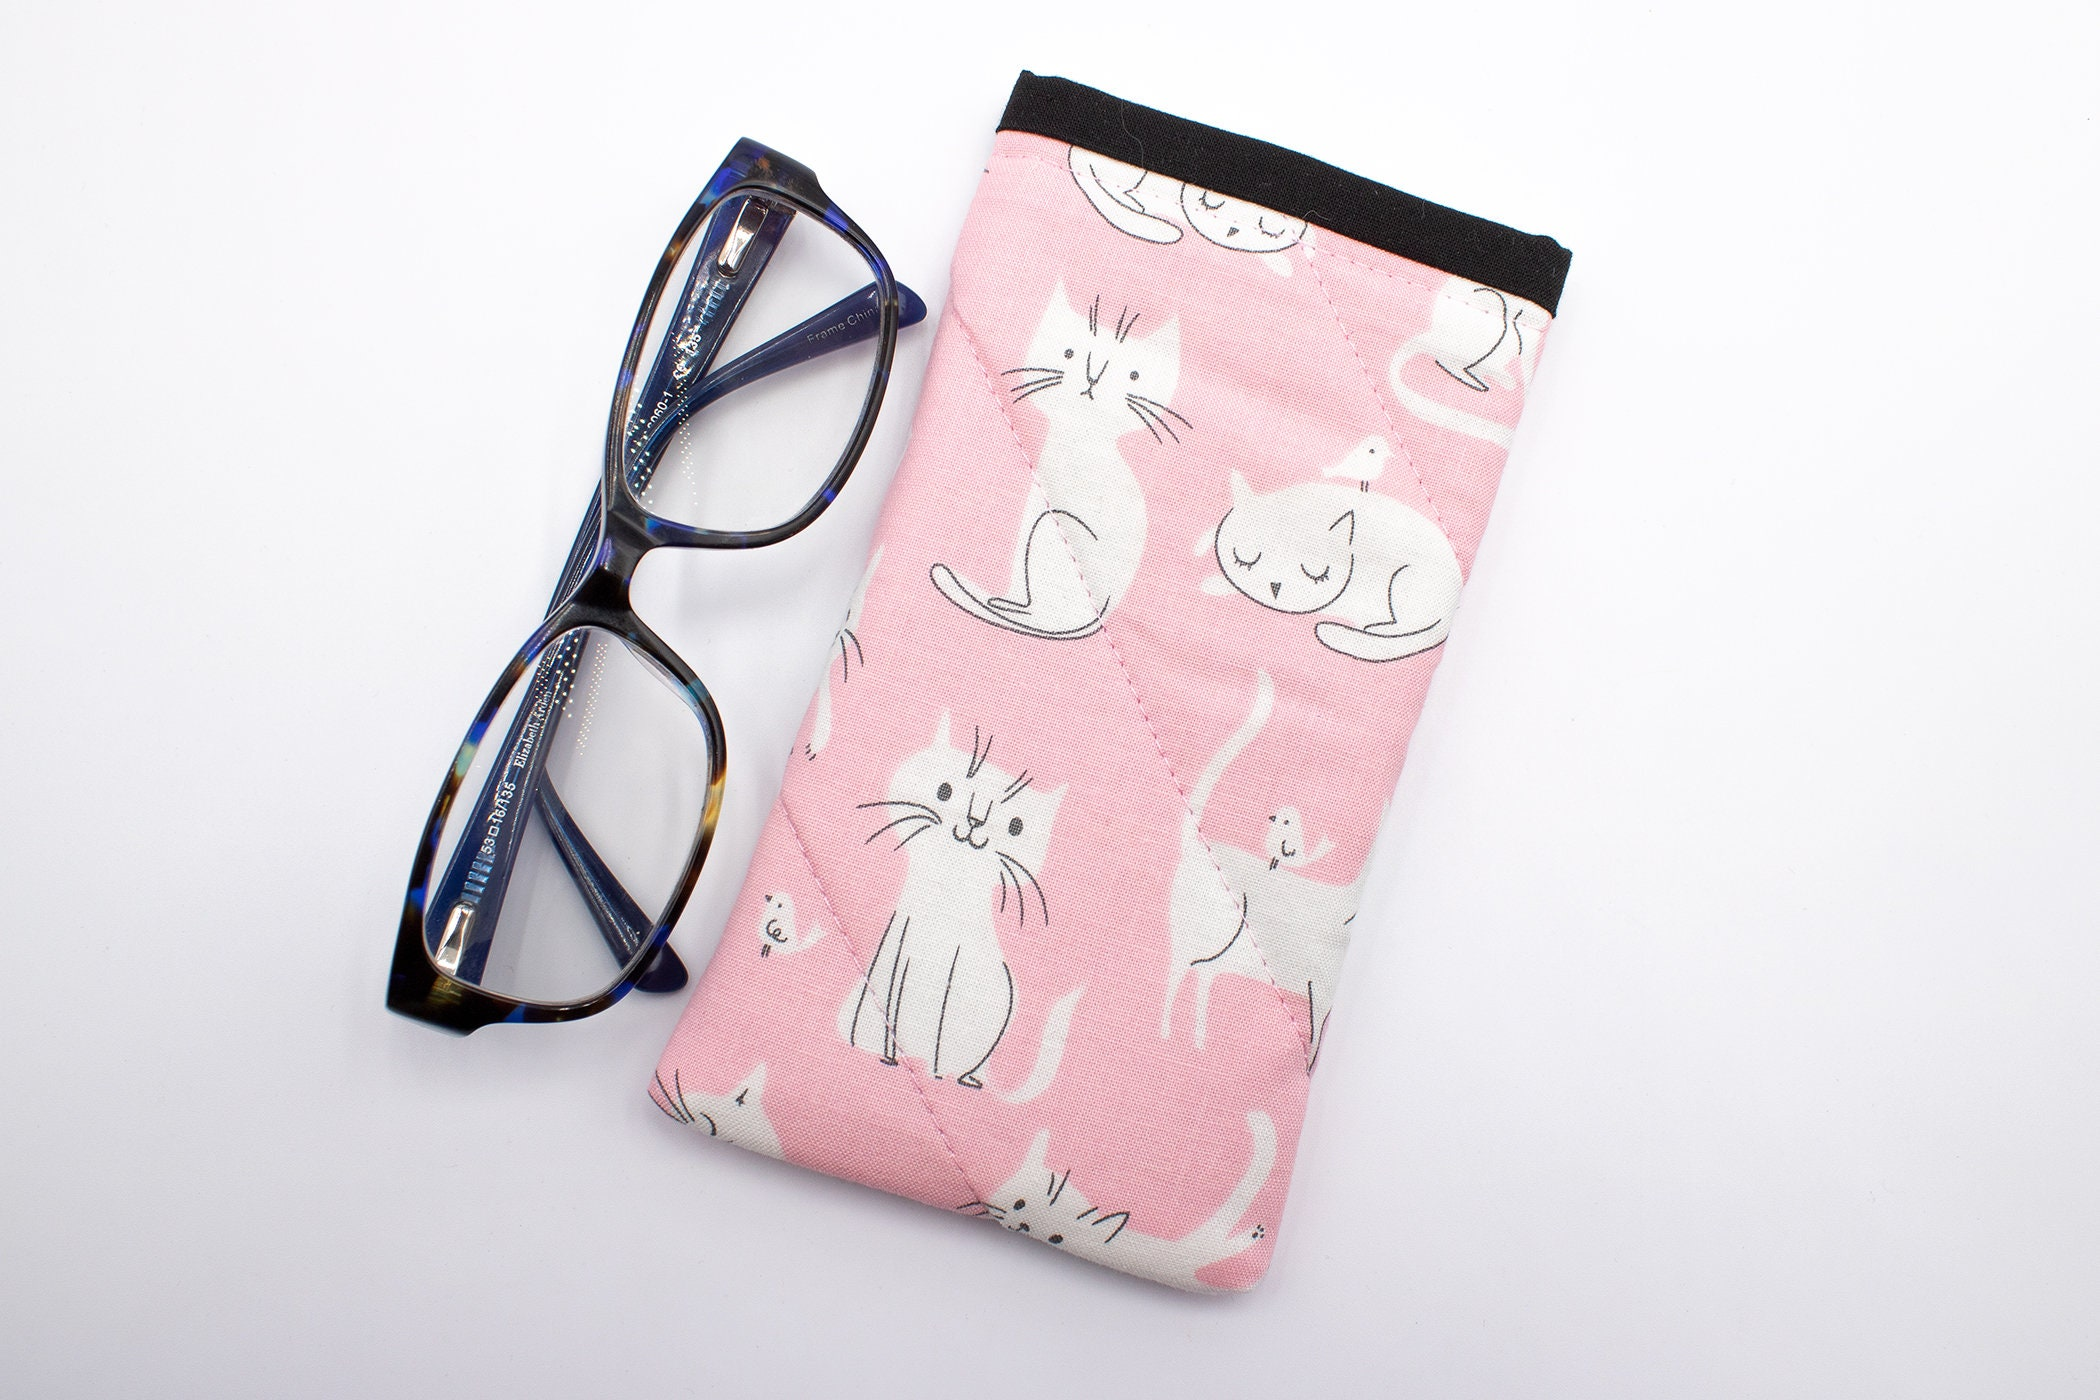 ikat Handmade ikat eyeglass case white-beige eyeglass case handmade accessory Handwoven ikat